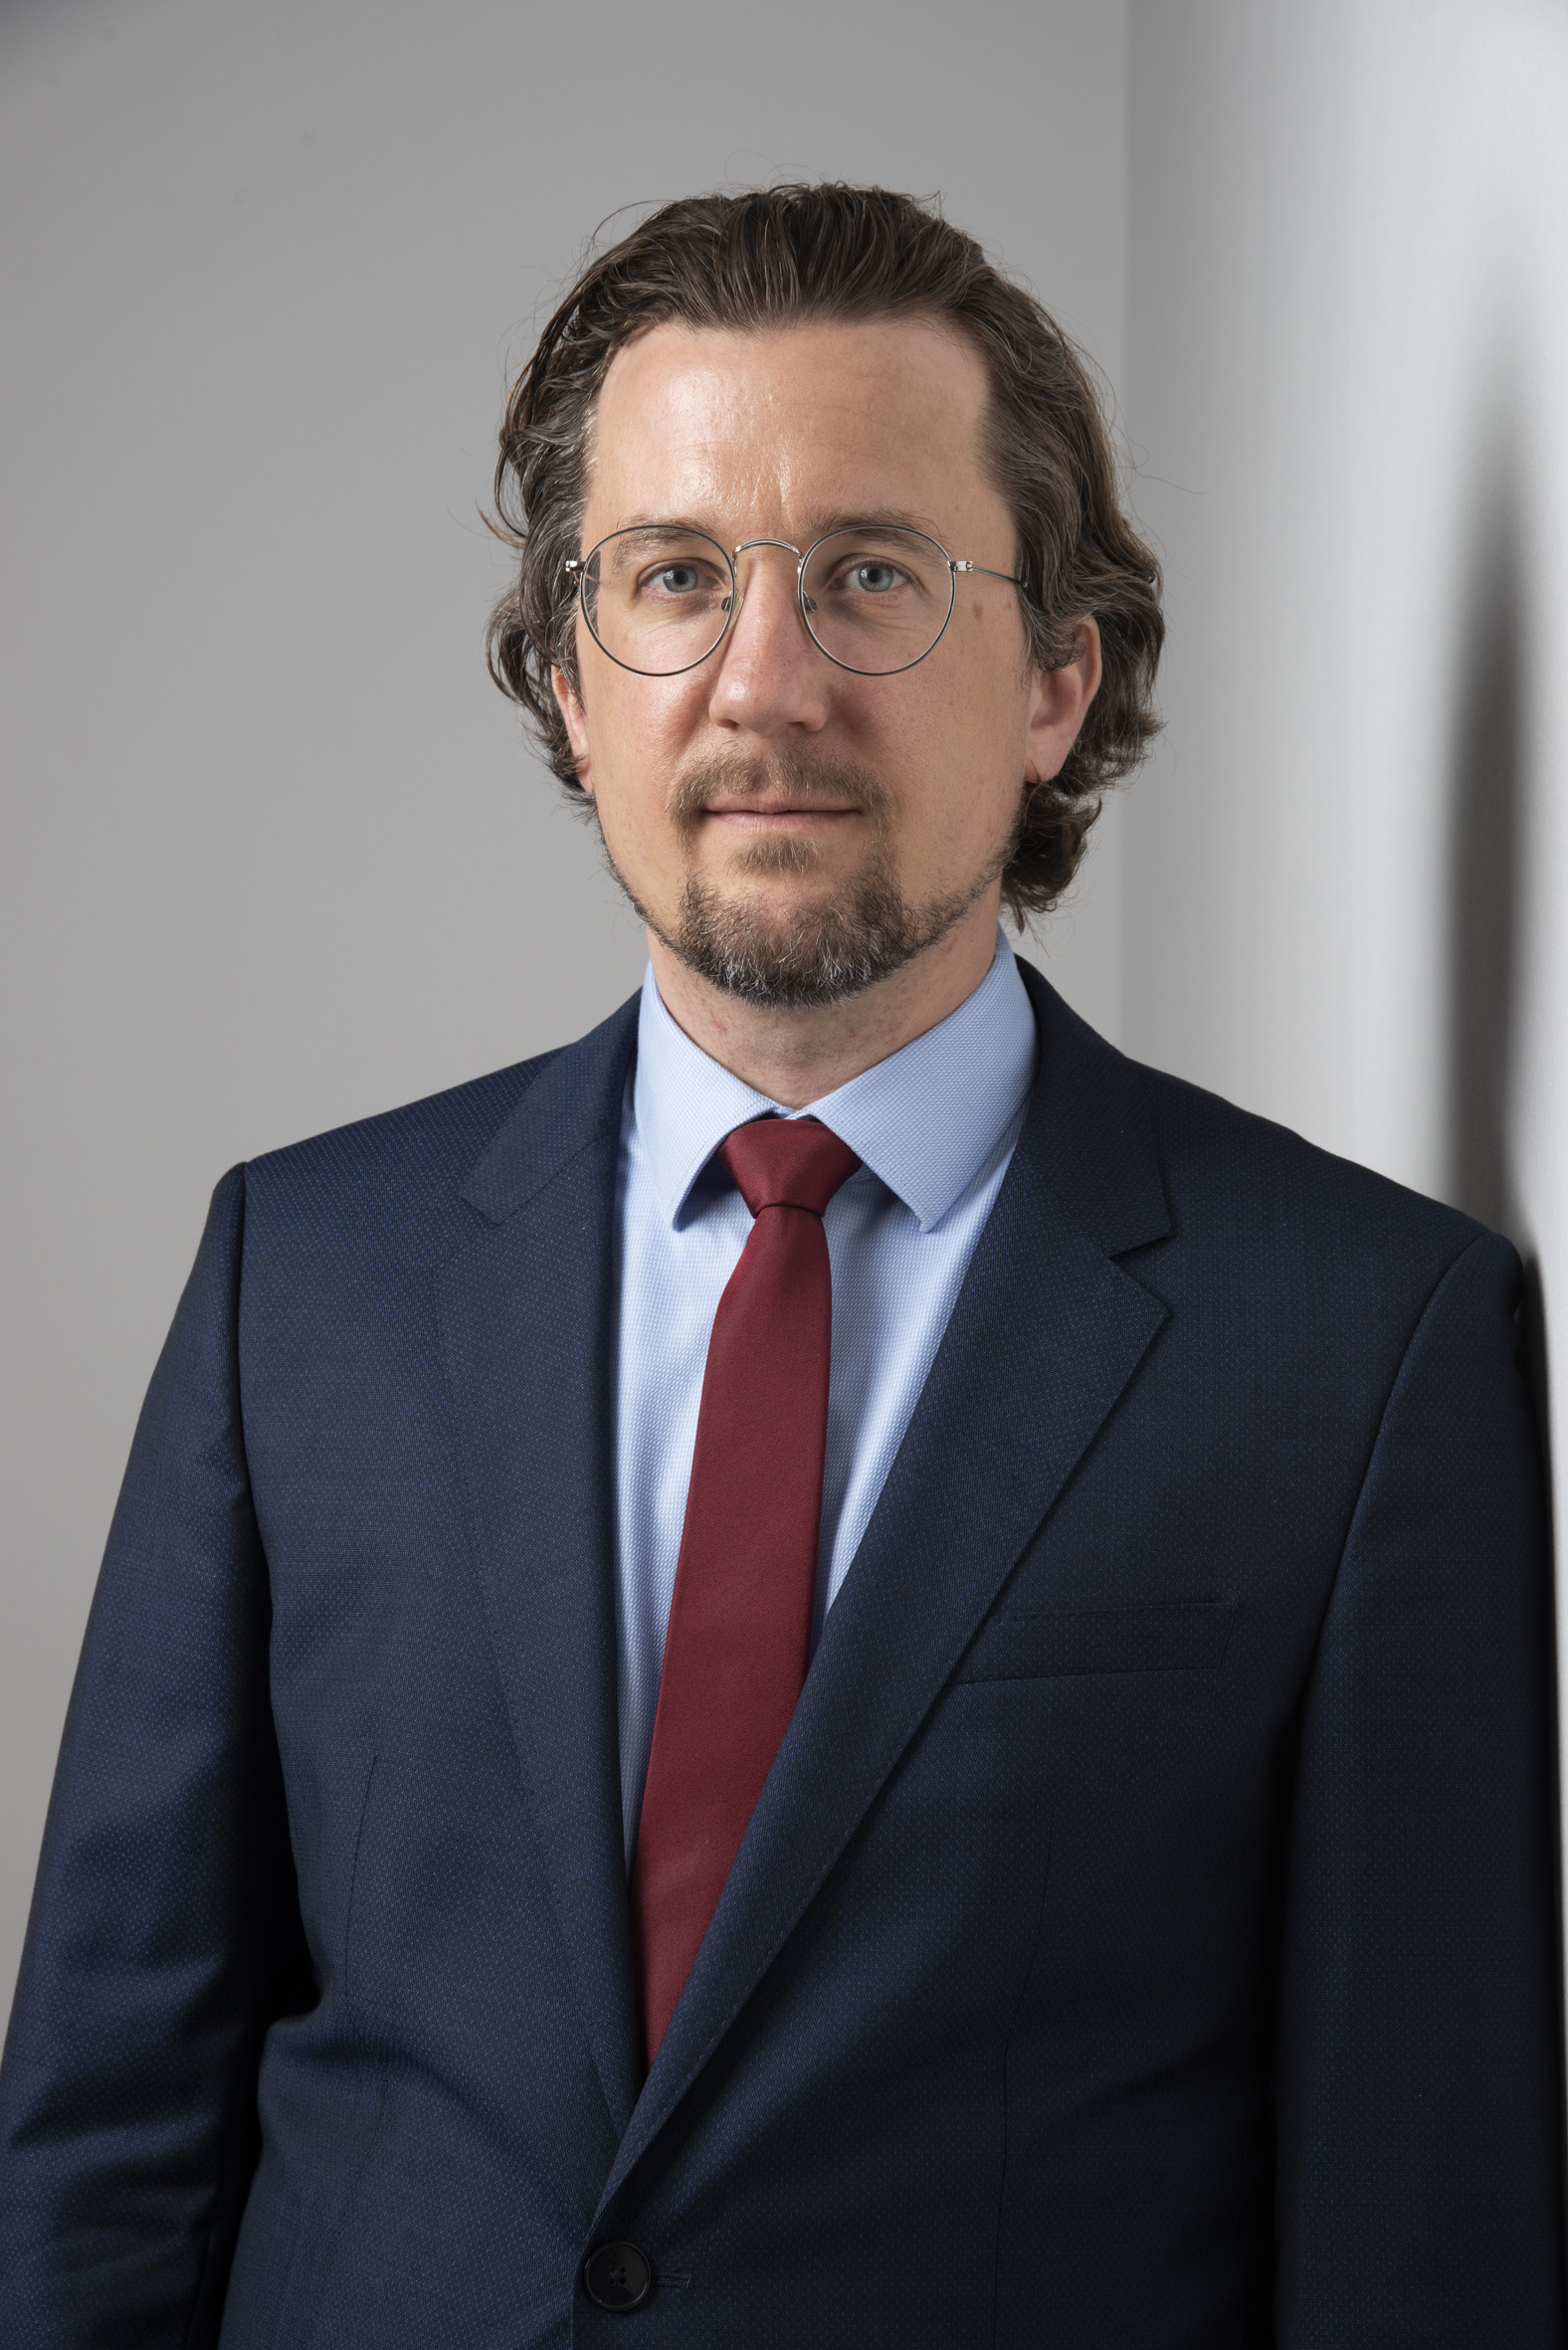 Jan Ristau